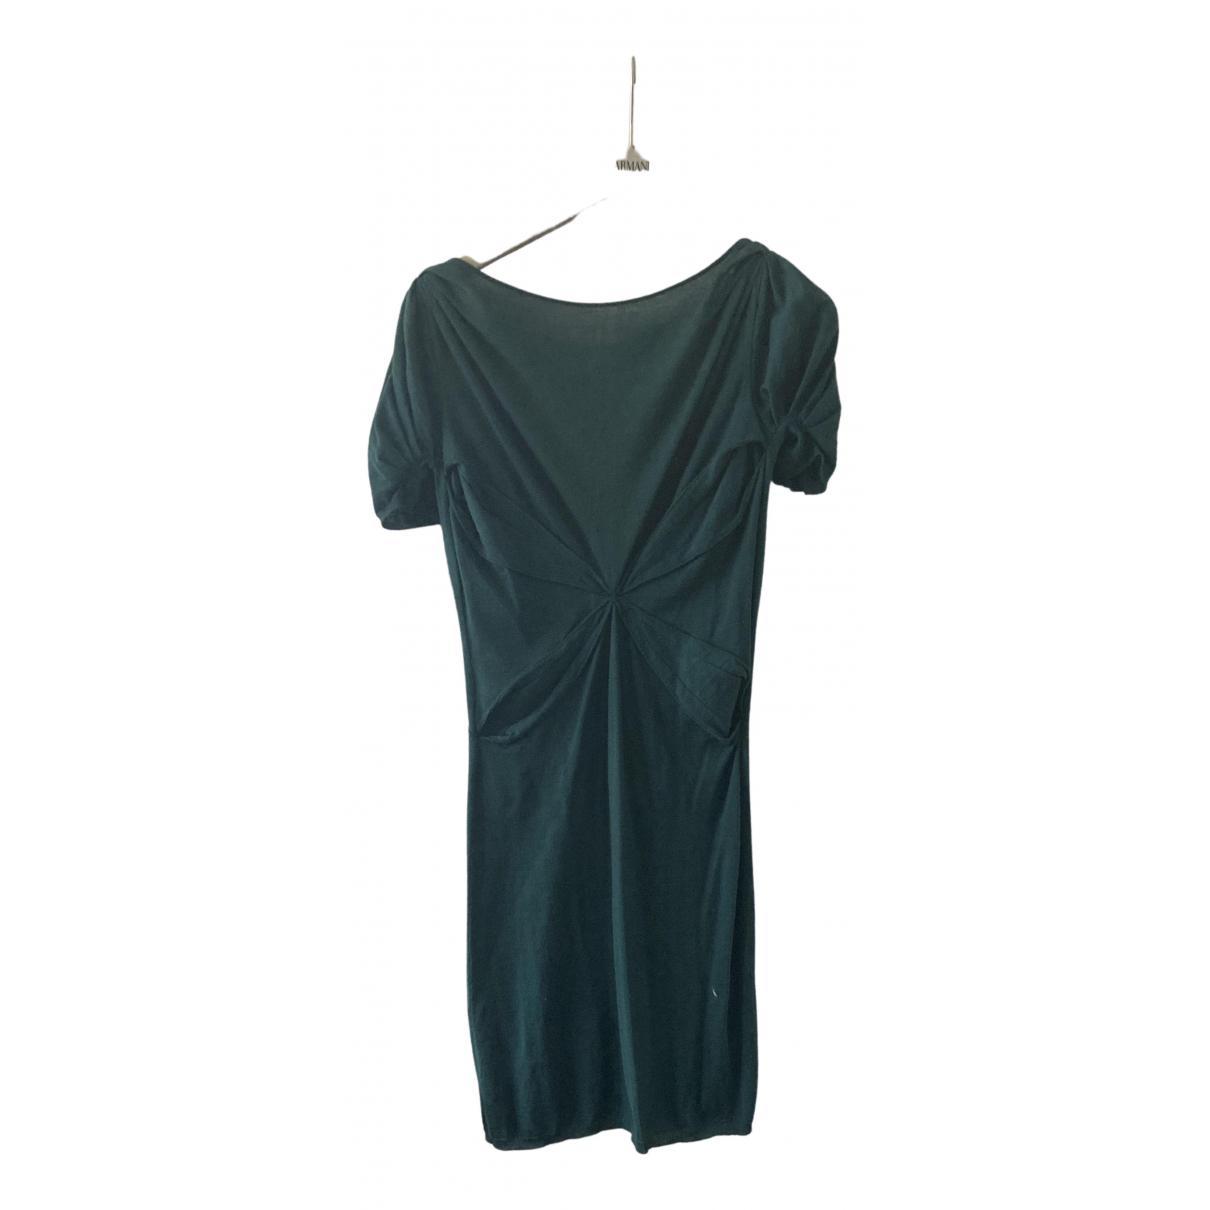 Anne Valerie Hash - Robe   pour femme en laine - vert